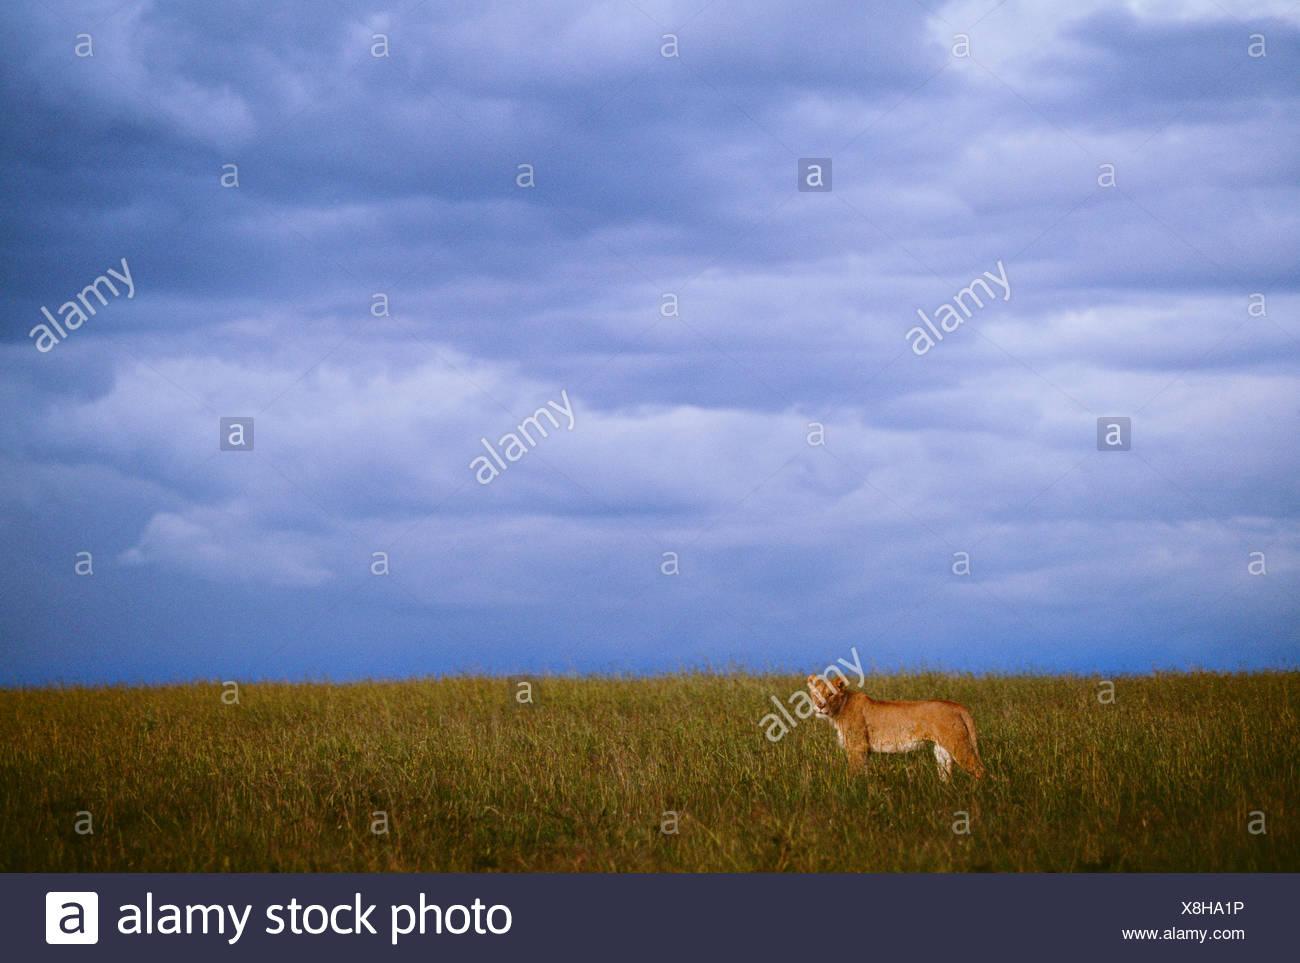 African lion, Masai Mara National Reserve, Kenya - Stock Image